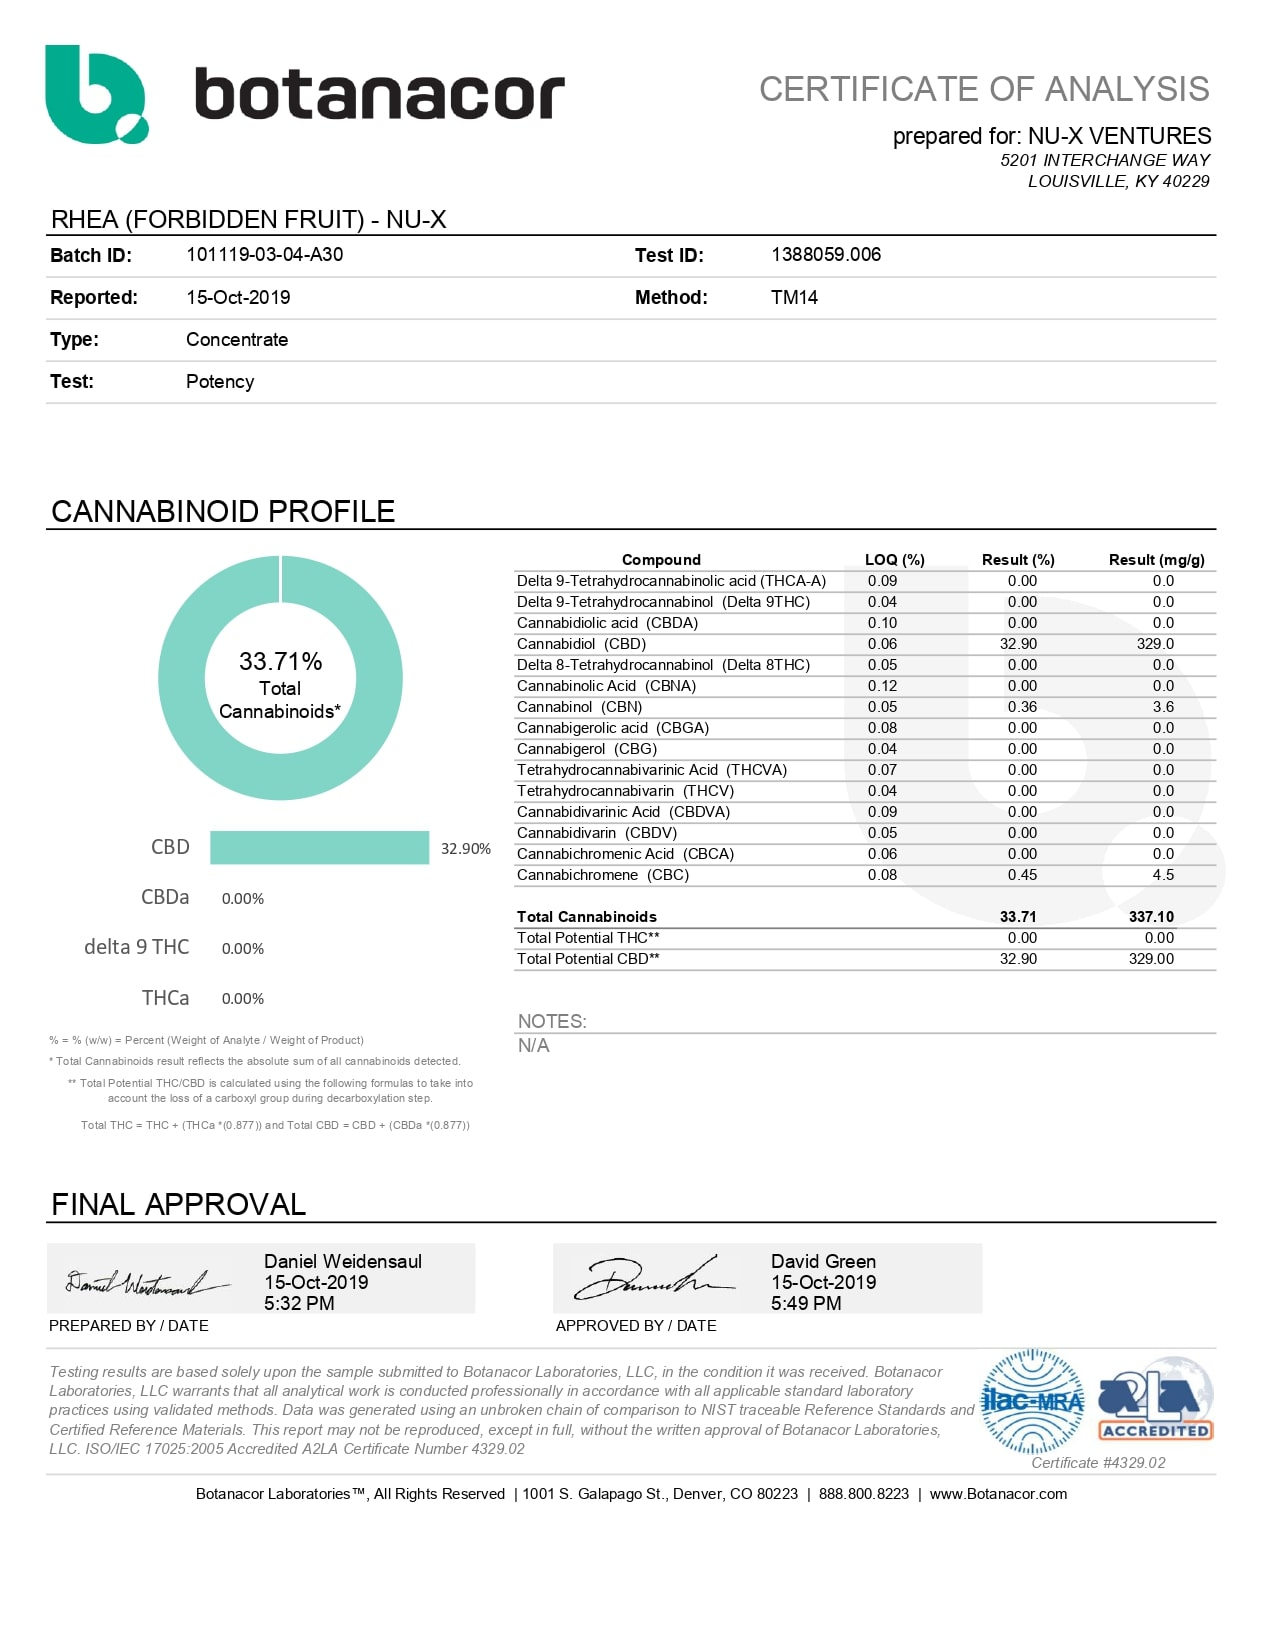 NU-X CBD eLiquid Concentrate Lab Report | Fruity - Rhea 3000mg